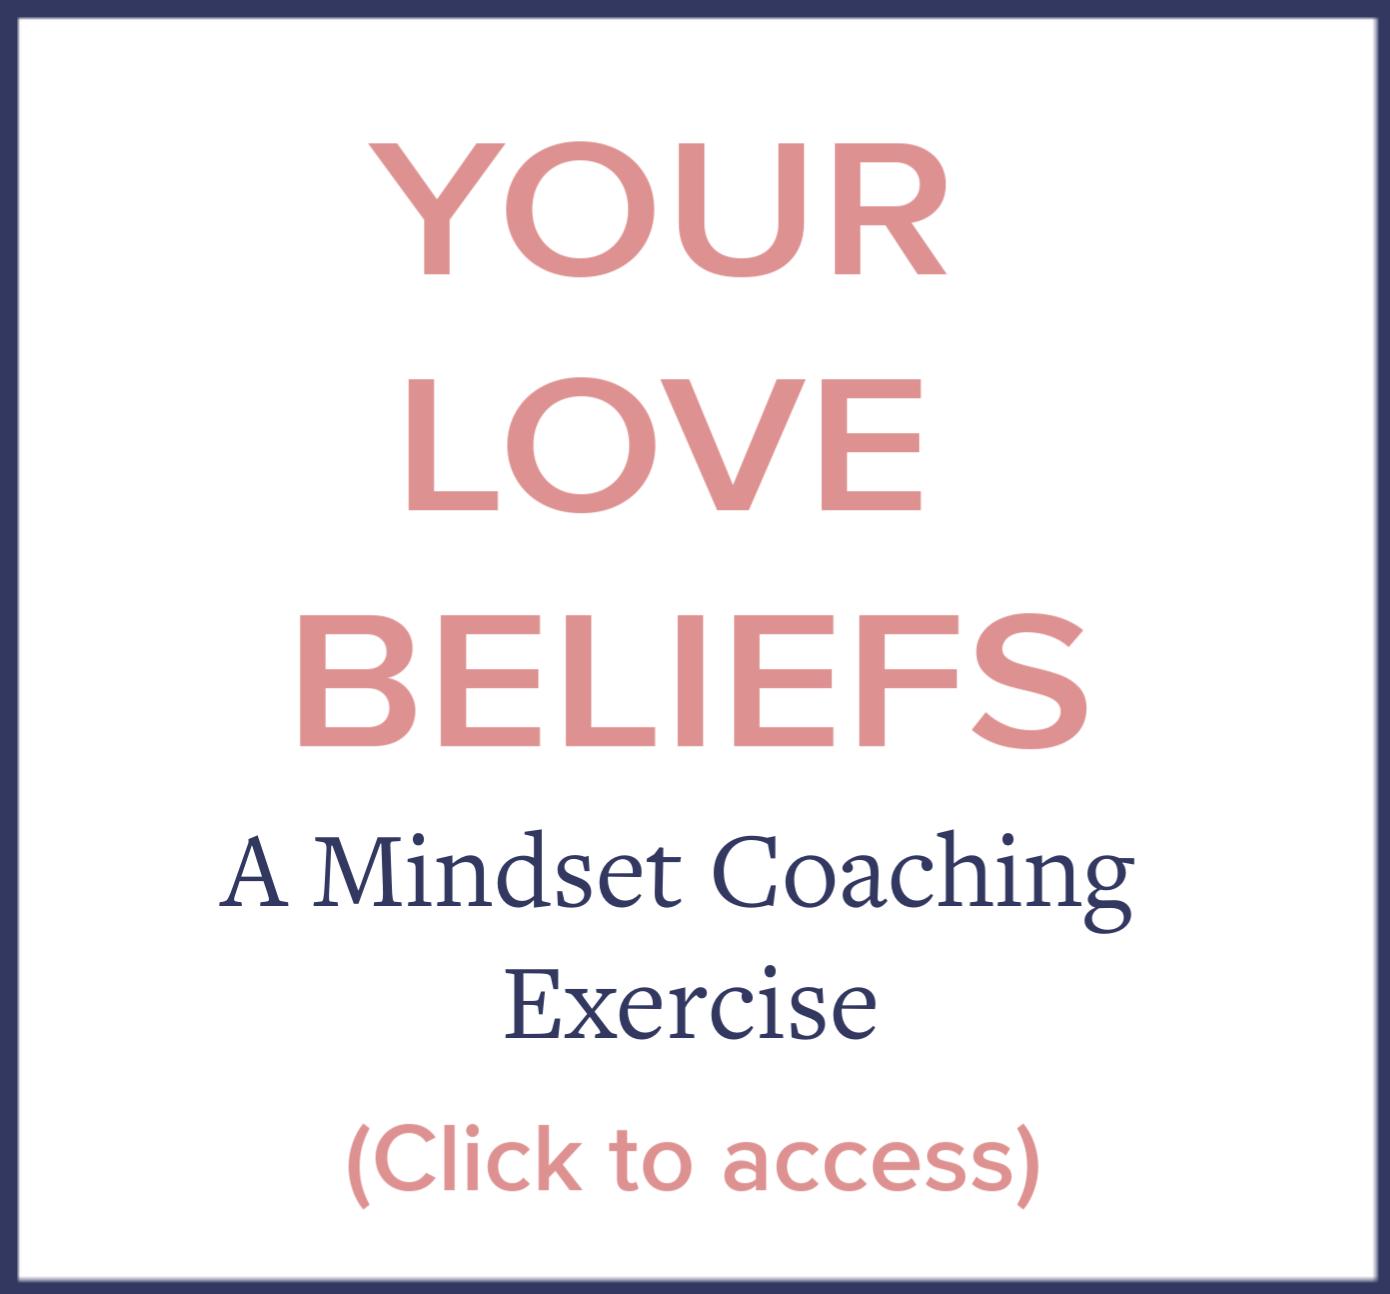 your love beliefs image.png